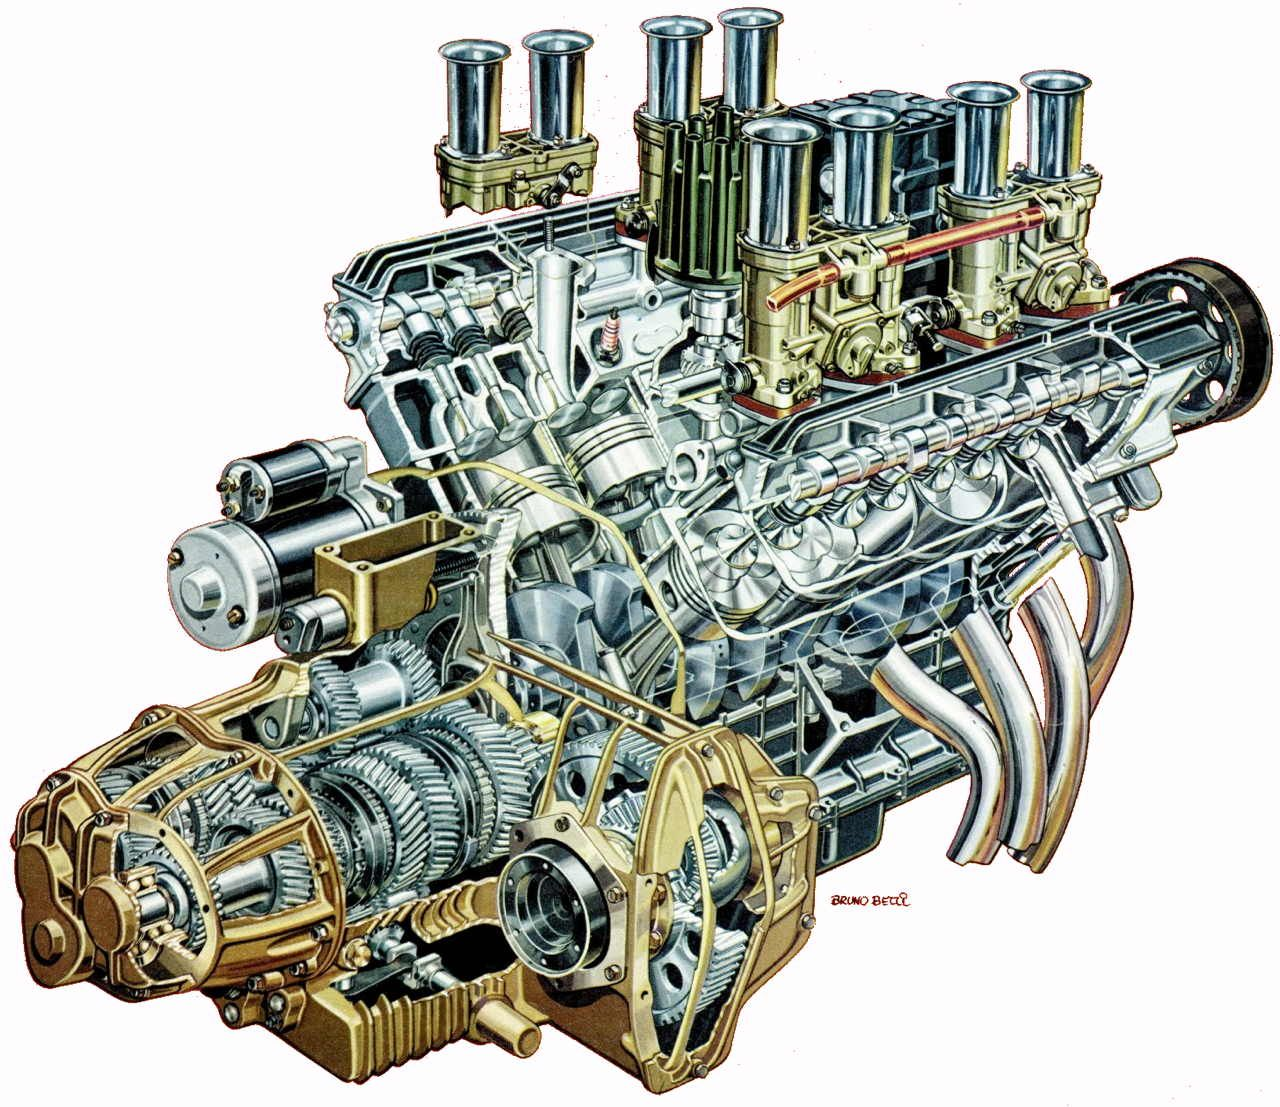 V8 engine cutaway illustration | Race Engines & Cutaways | Mechanical engineering, Technical